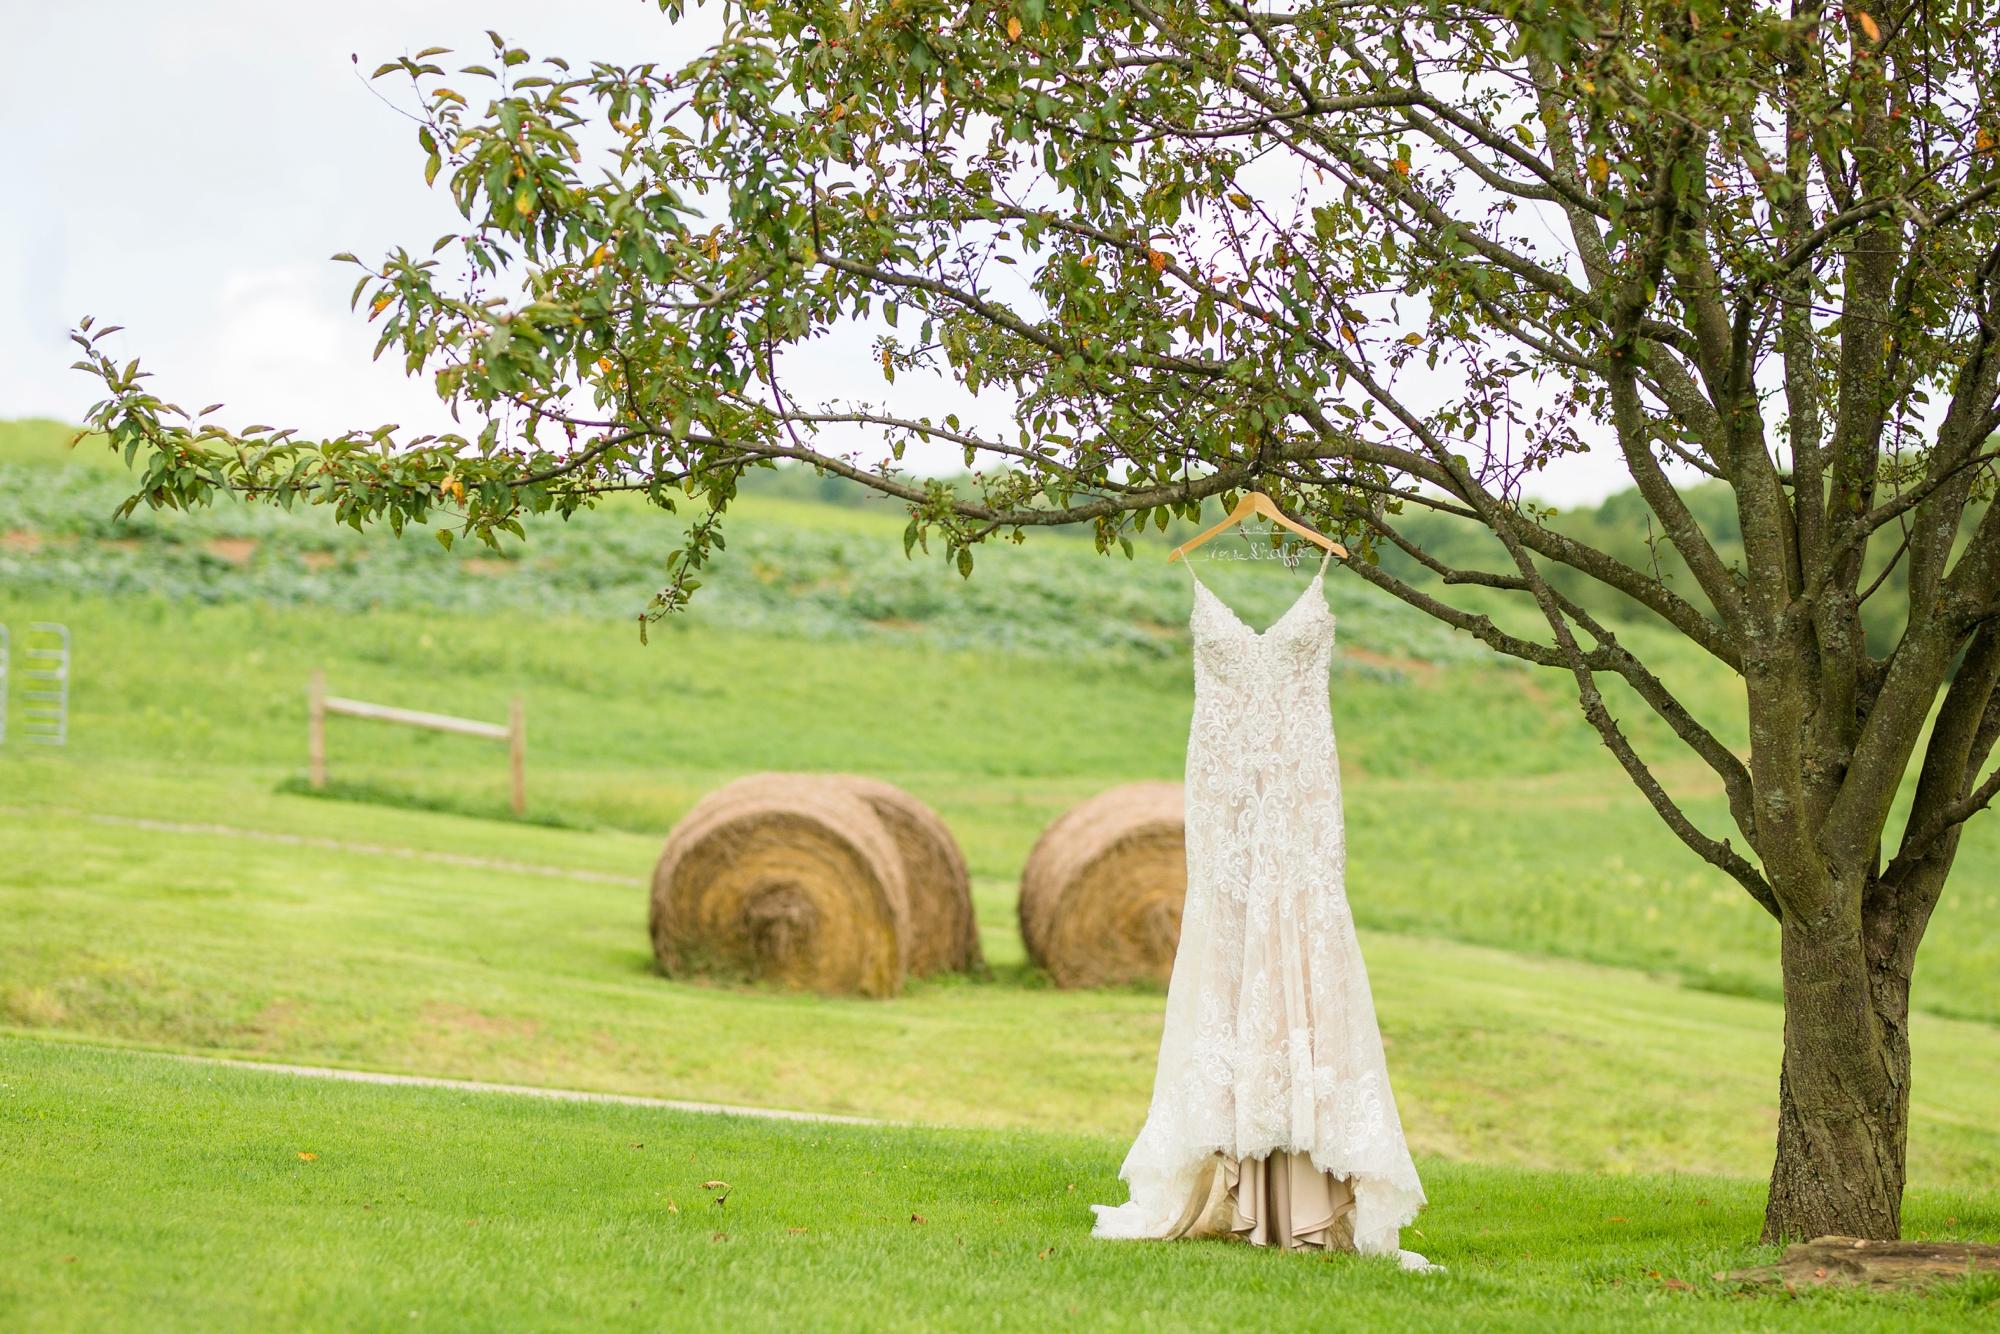 renshaw family farms wedding photos, renshaw family farms freeport pa, pittsburgh wedding photographer, pittsburgh wedding venues, bride and groom posing ideas, wedding photo ideas